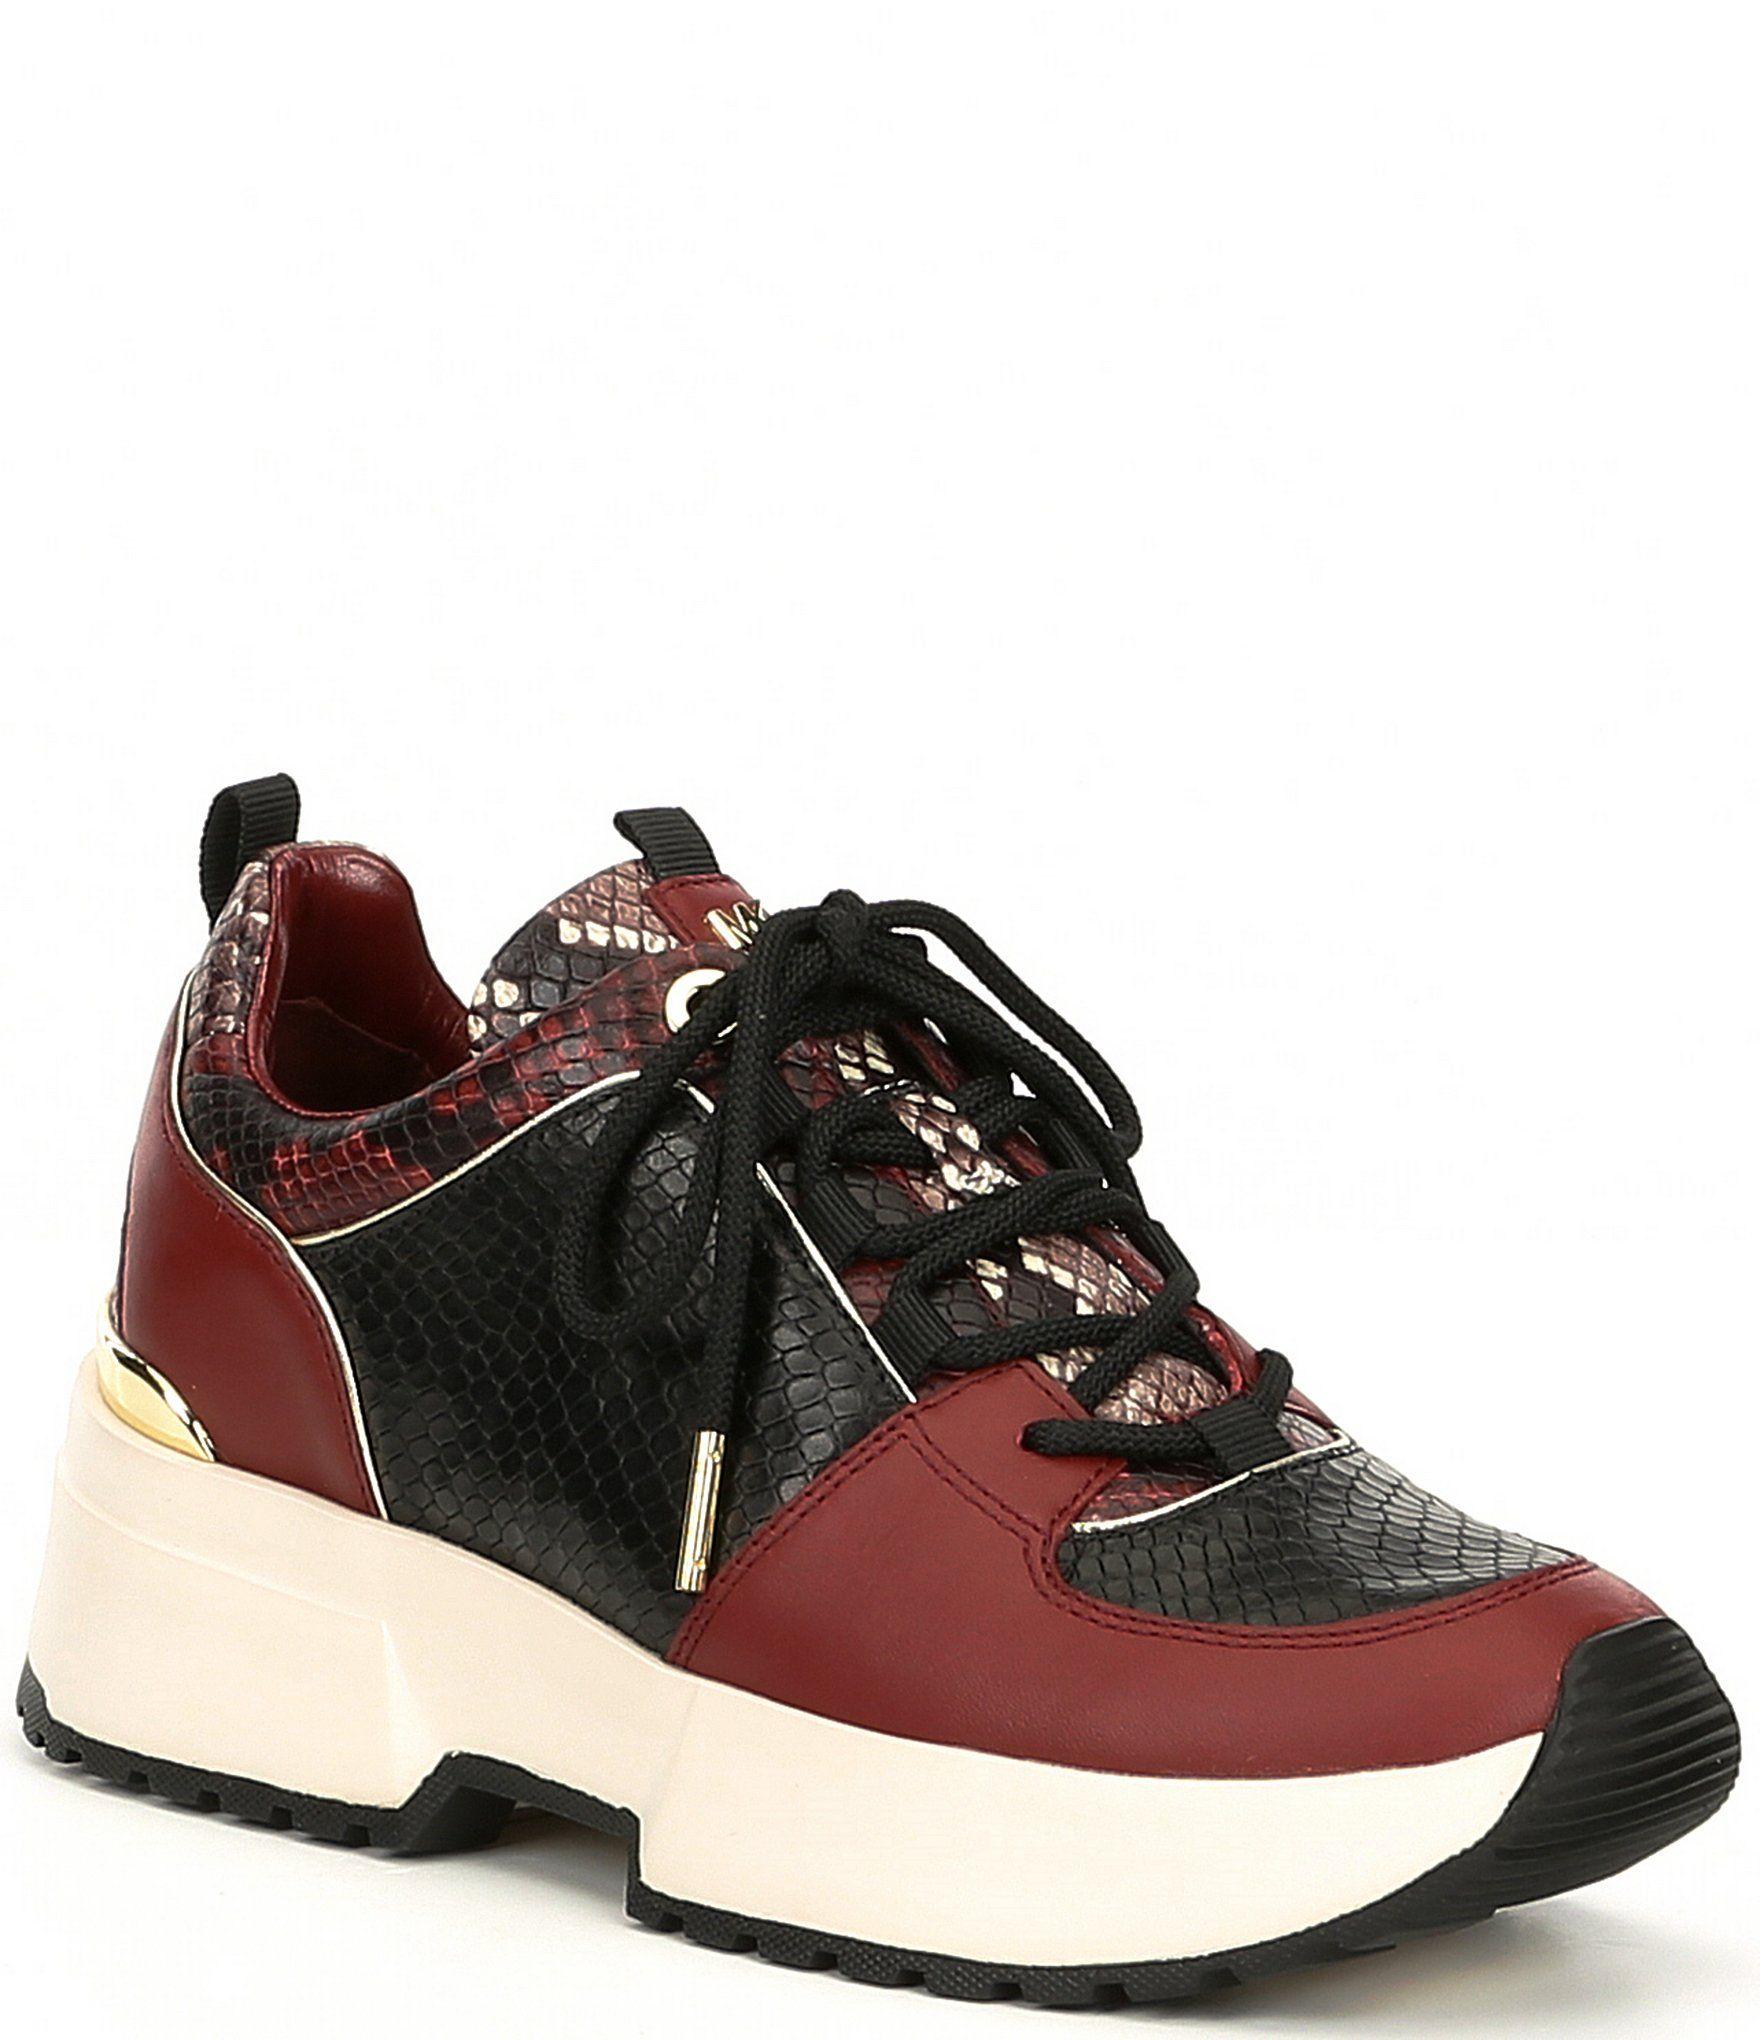 MICHAEL Michael Kors Cosmo Snake Print Embossed Leather & Metallic Leather Wedge Trainers | Dillard's